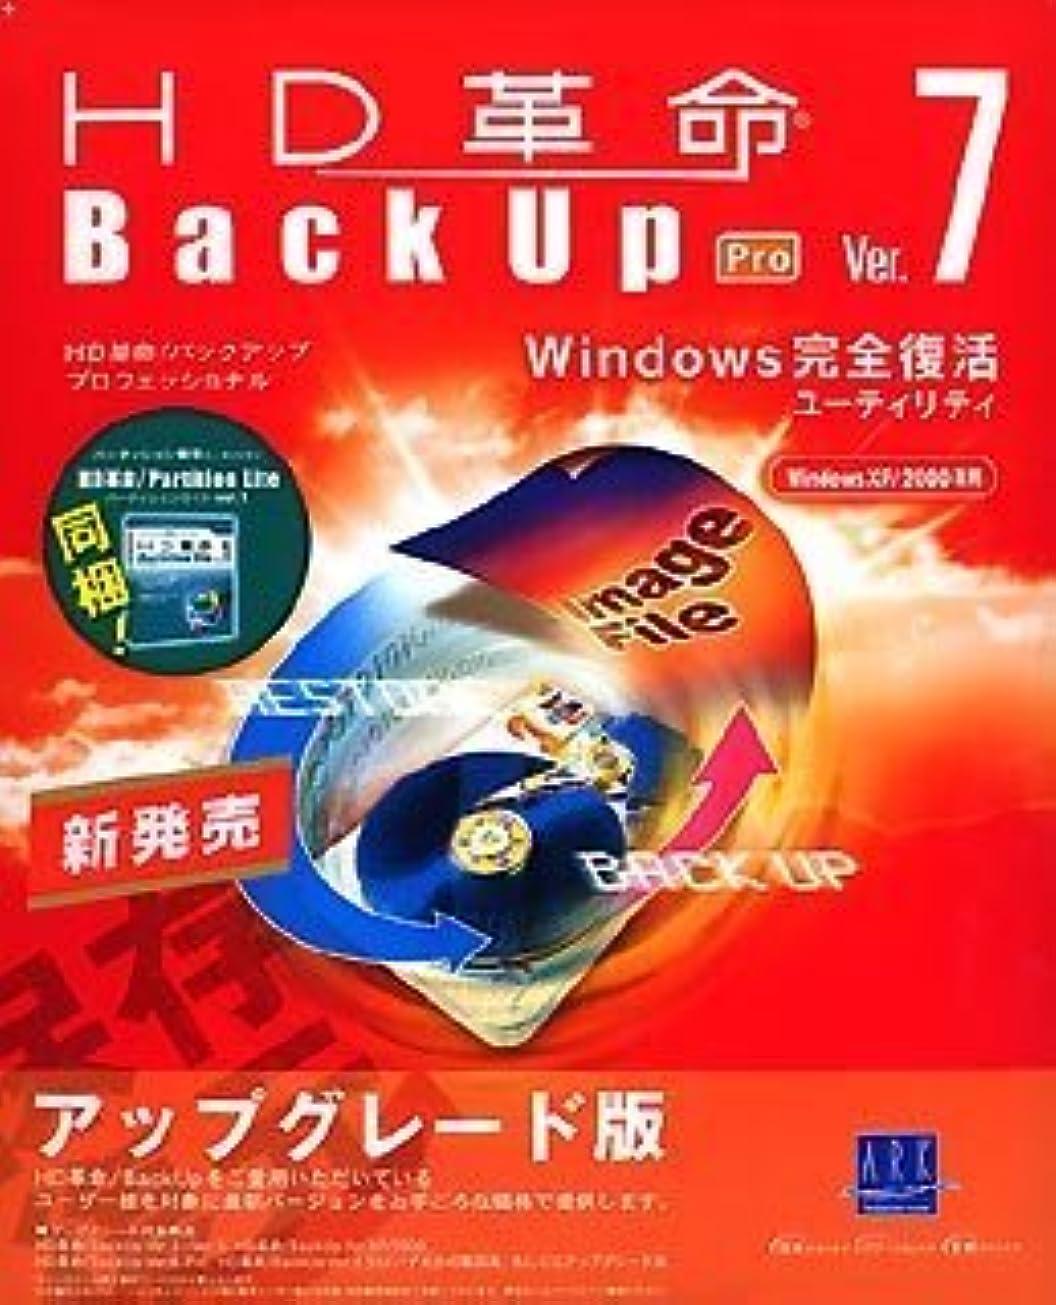 HD革命/BackUp Ver.7 Pro(Win2000、XP専用)アップグレード版